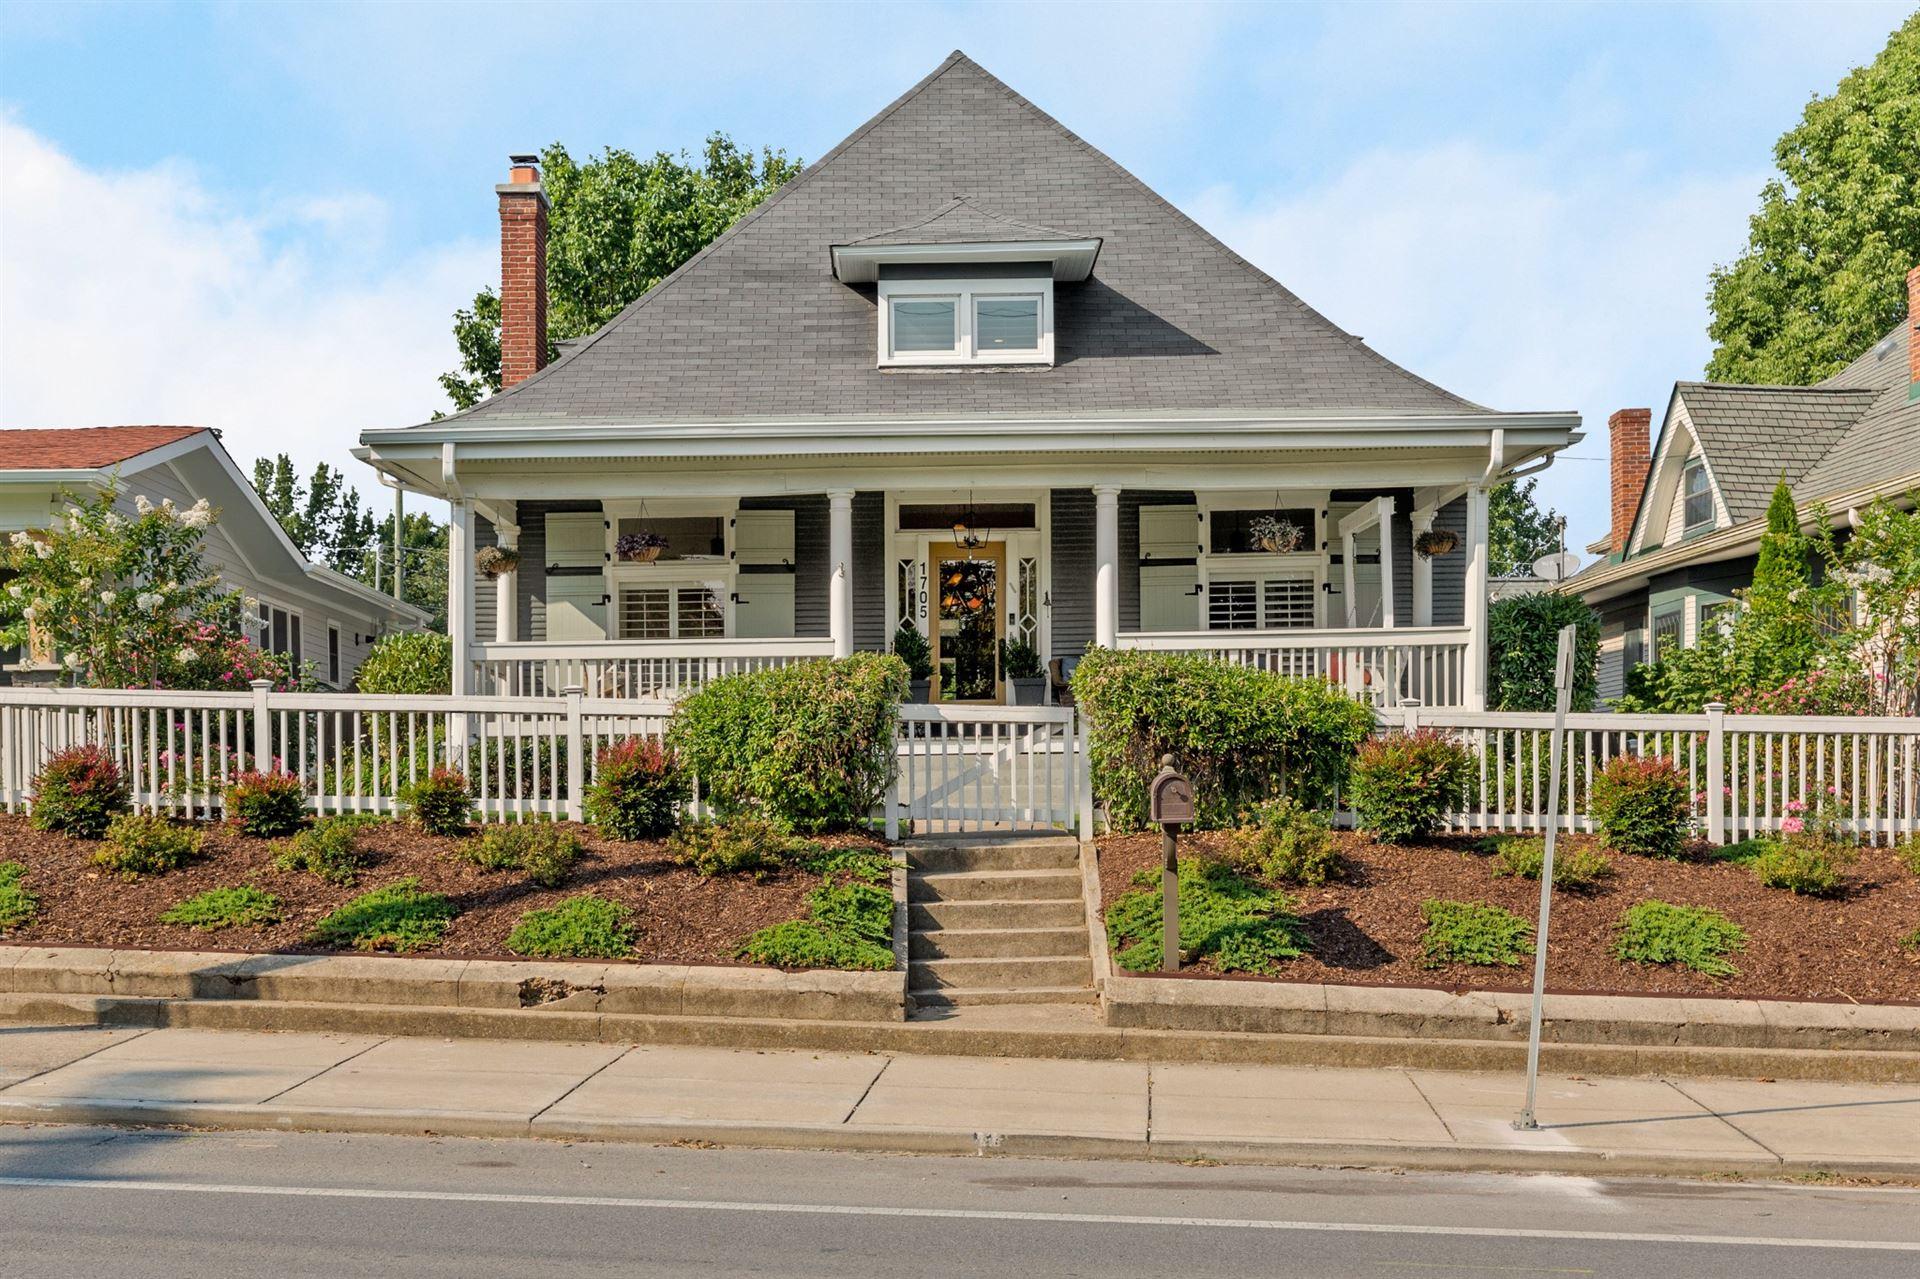 Photo of 1705 Eastland Ave, Nashville, TN 37206 (MLS # 2292527)